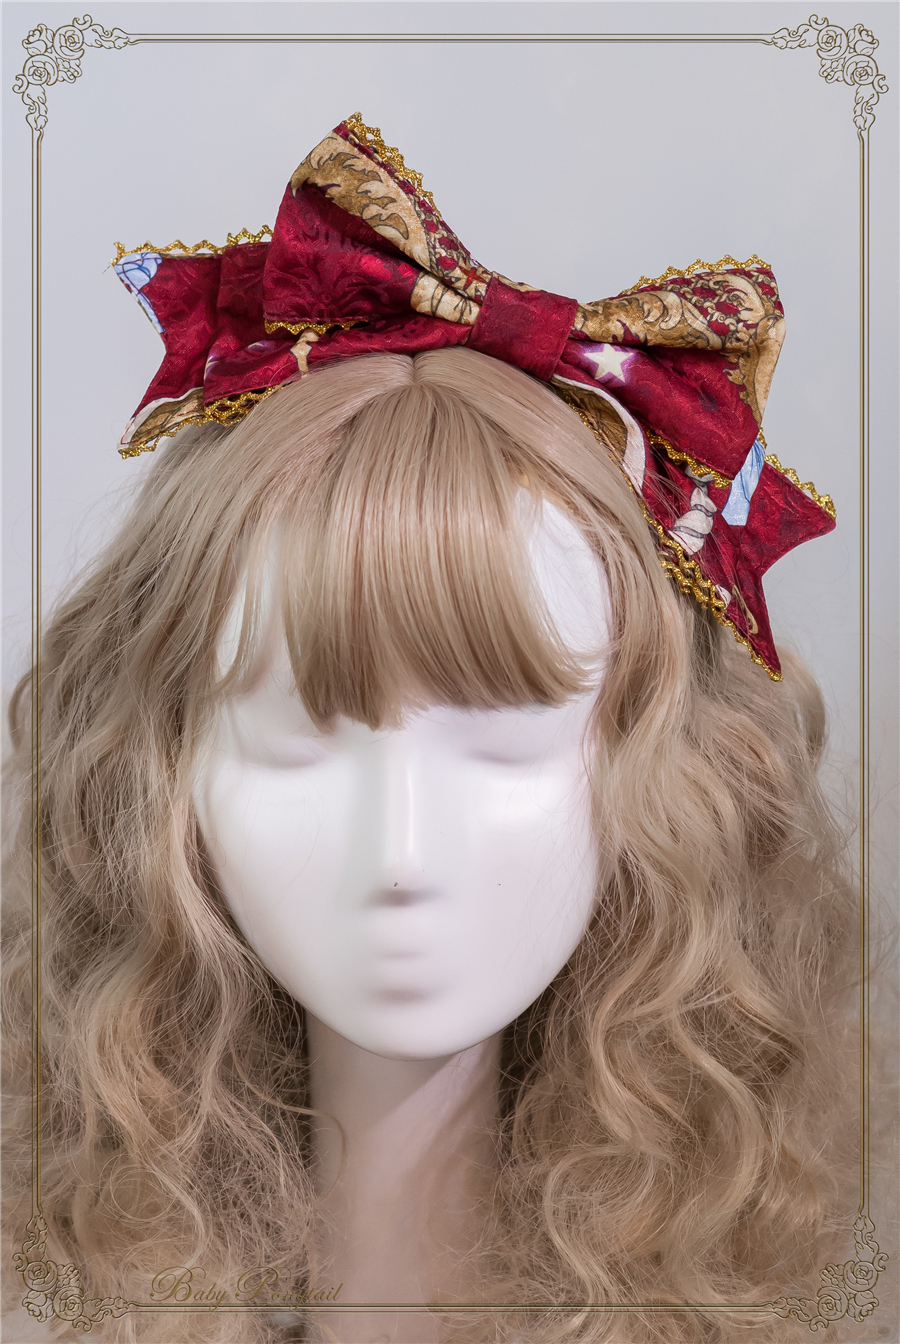 Baby Ponytail_Stock photo_Circus Princess_KC Red_02.jpg